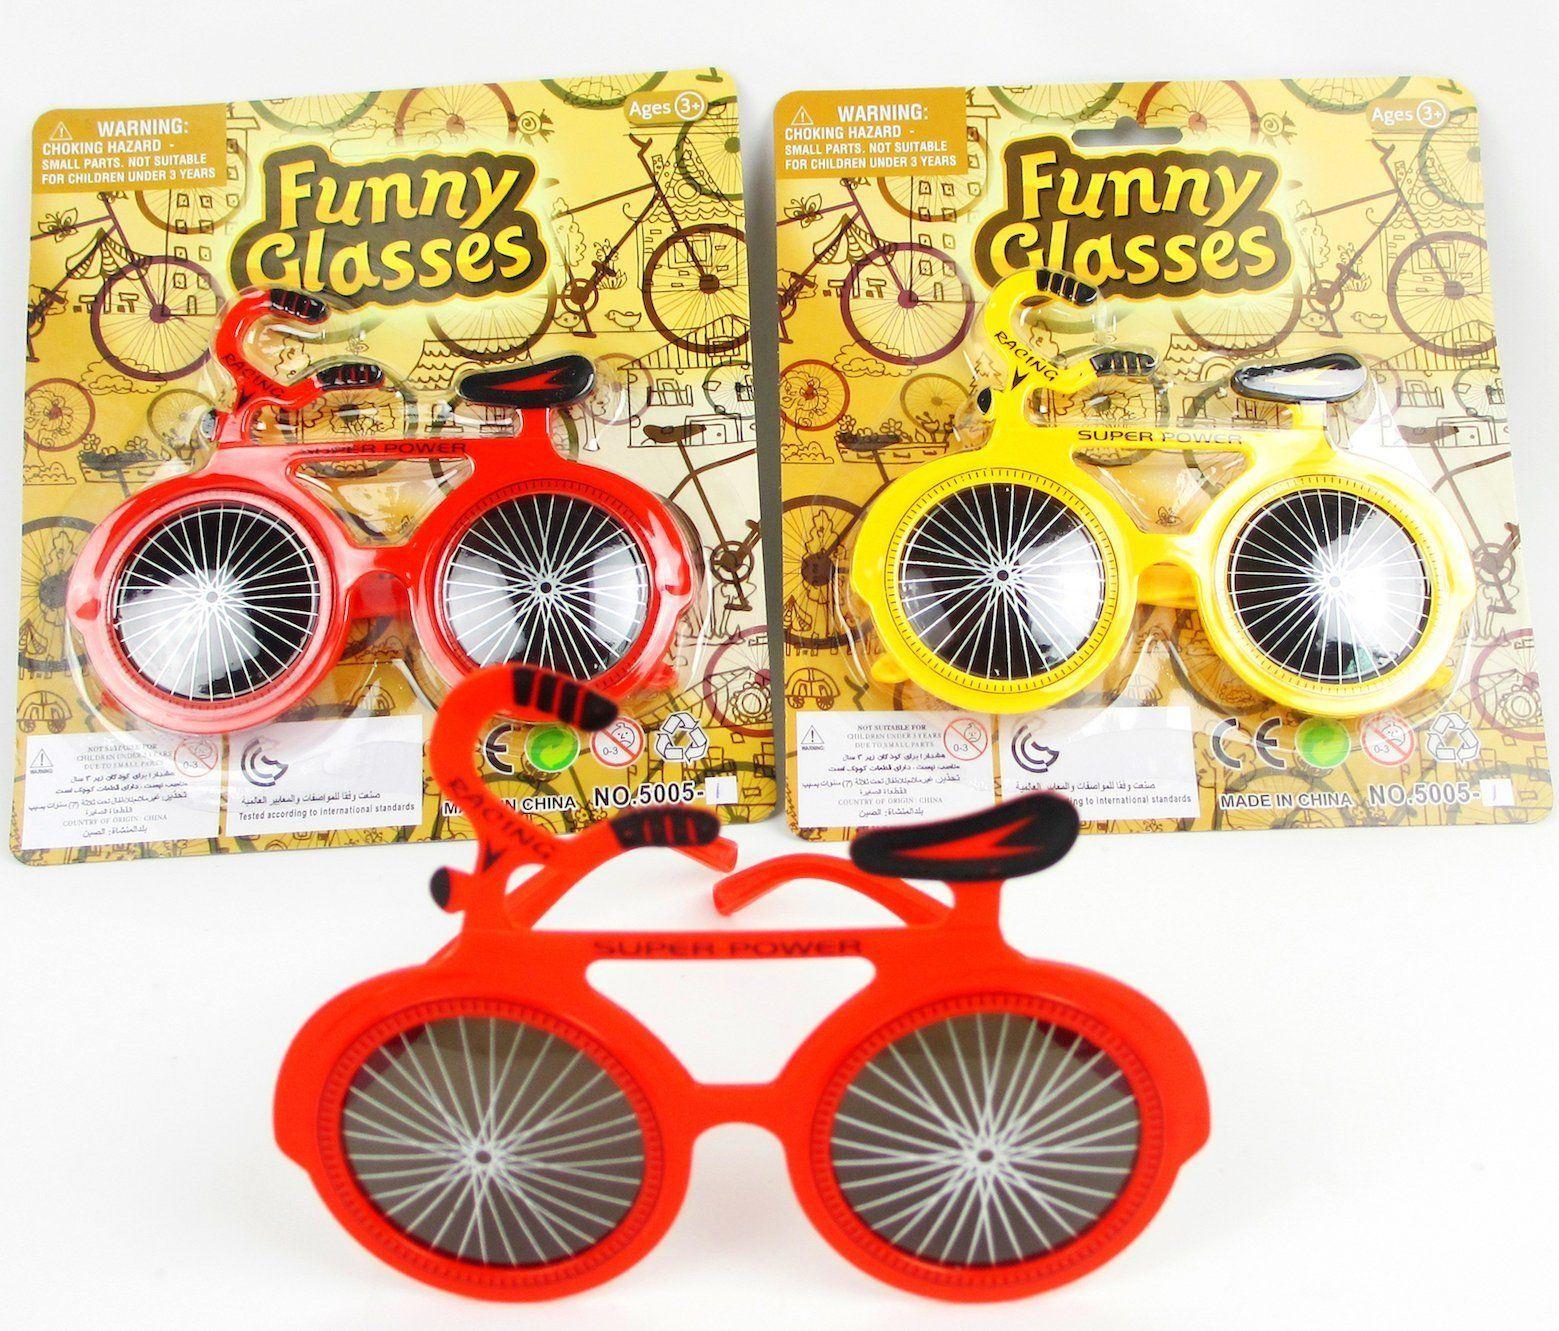 thumbnail 18 - Glasses Joke Sunglasses Fancy Dress Costume Party Fun Photo Booth Prop 1-12Pcs